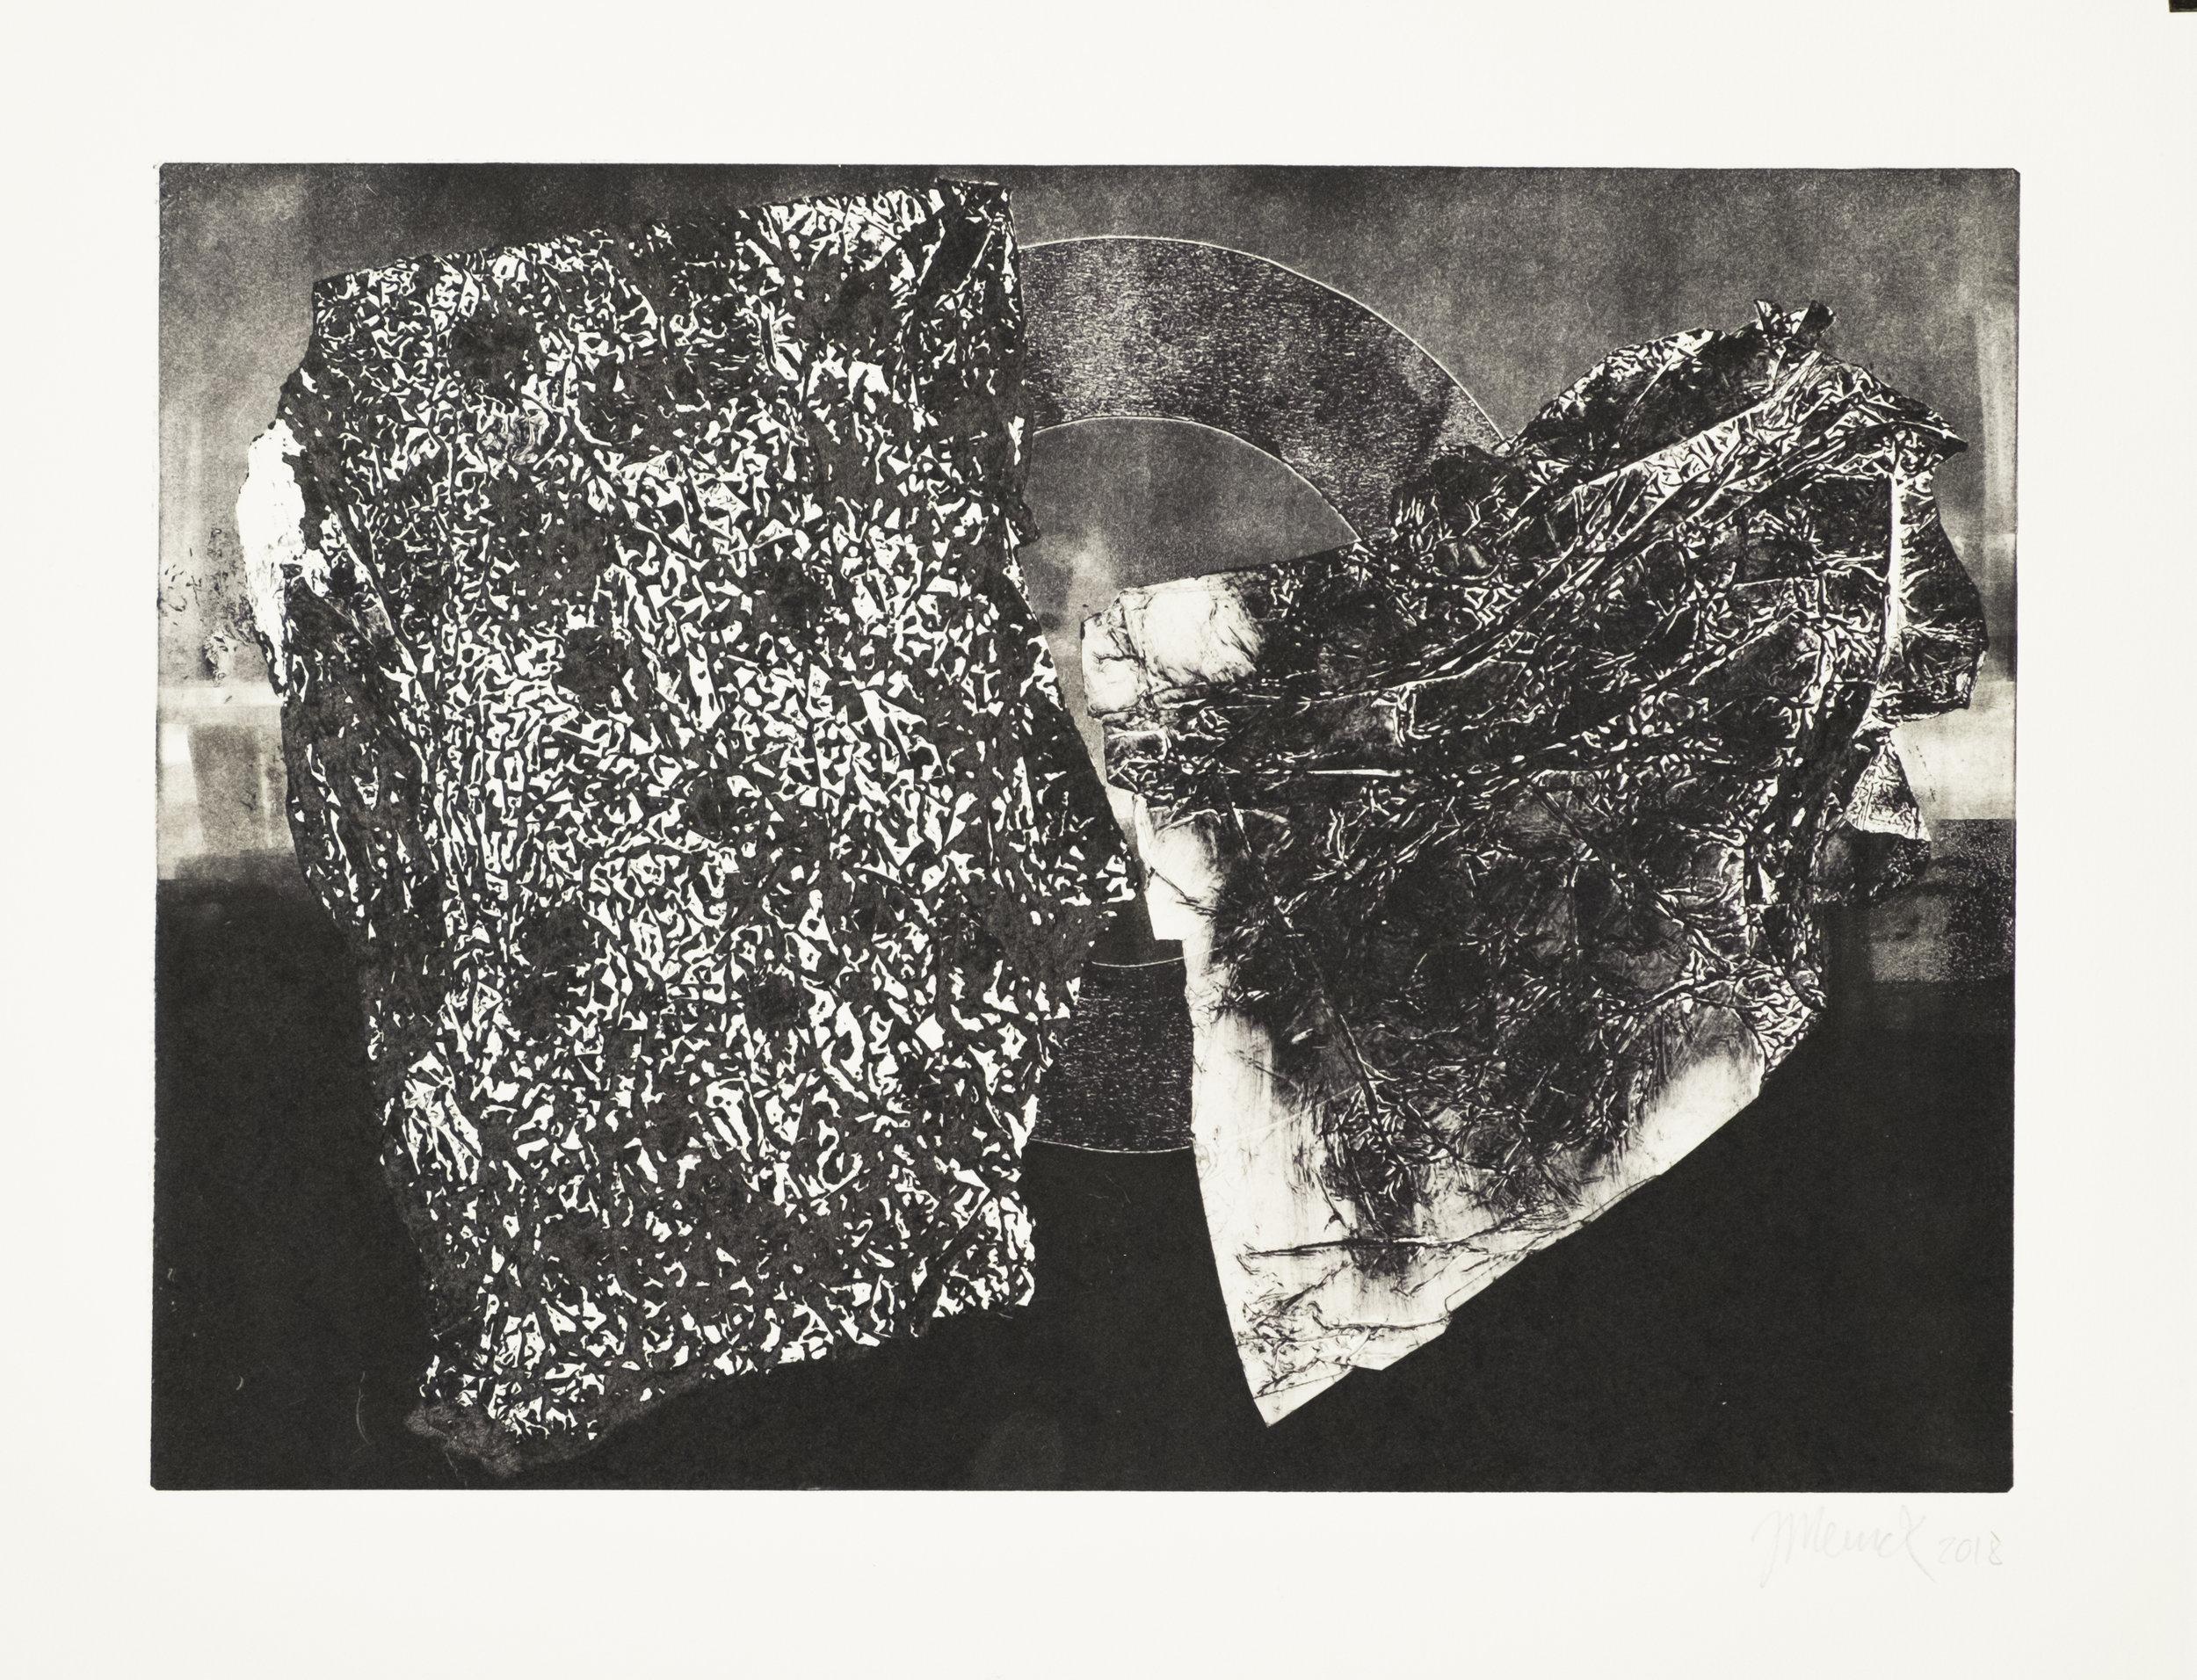 Forms on black 24 (34 cm x 24 cm)